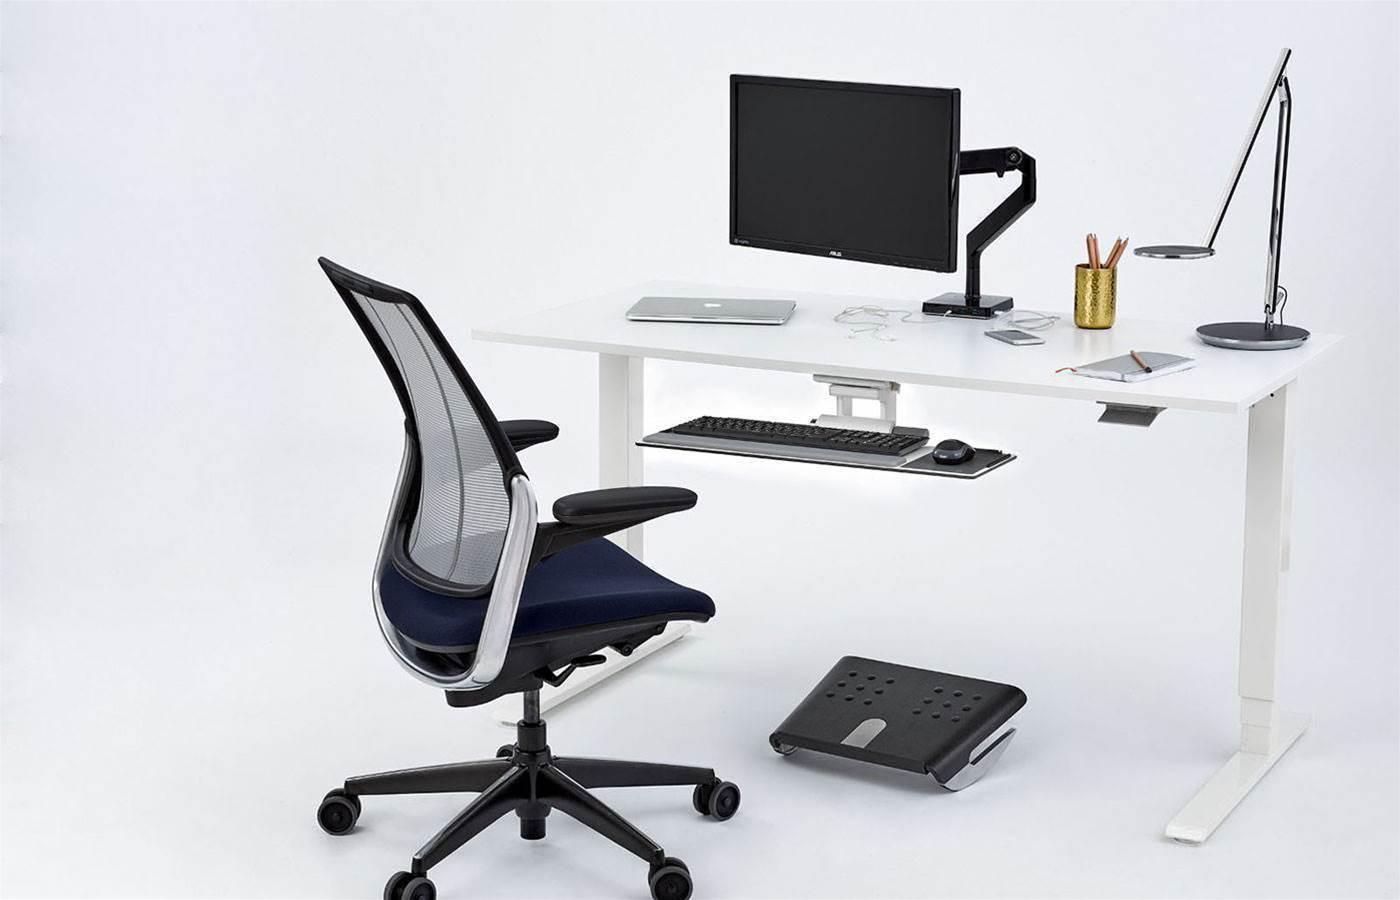 Sektor adds office furniture vendor Humanscale